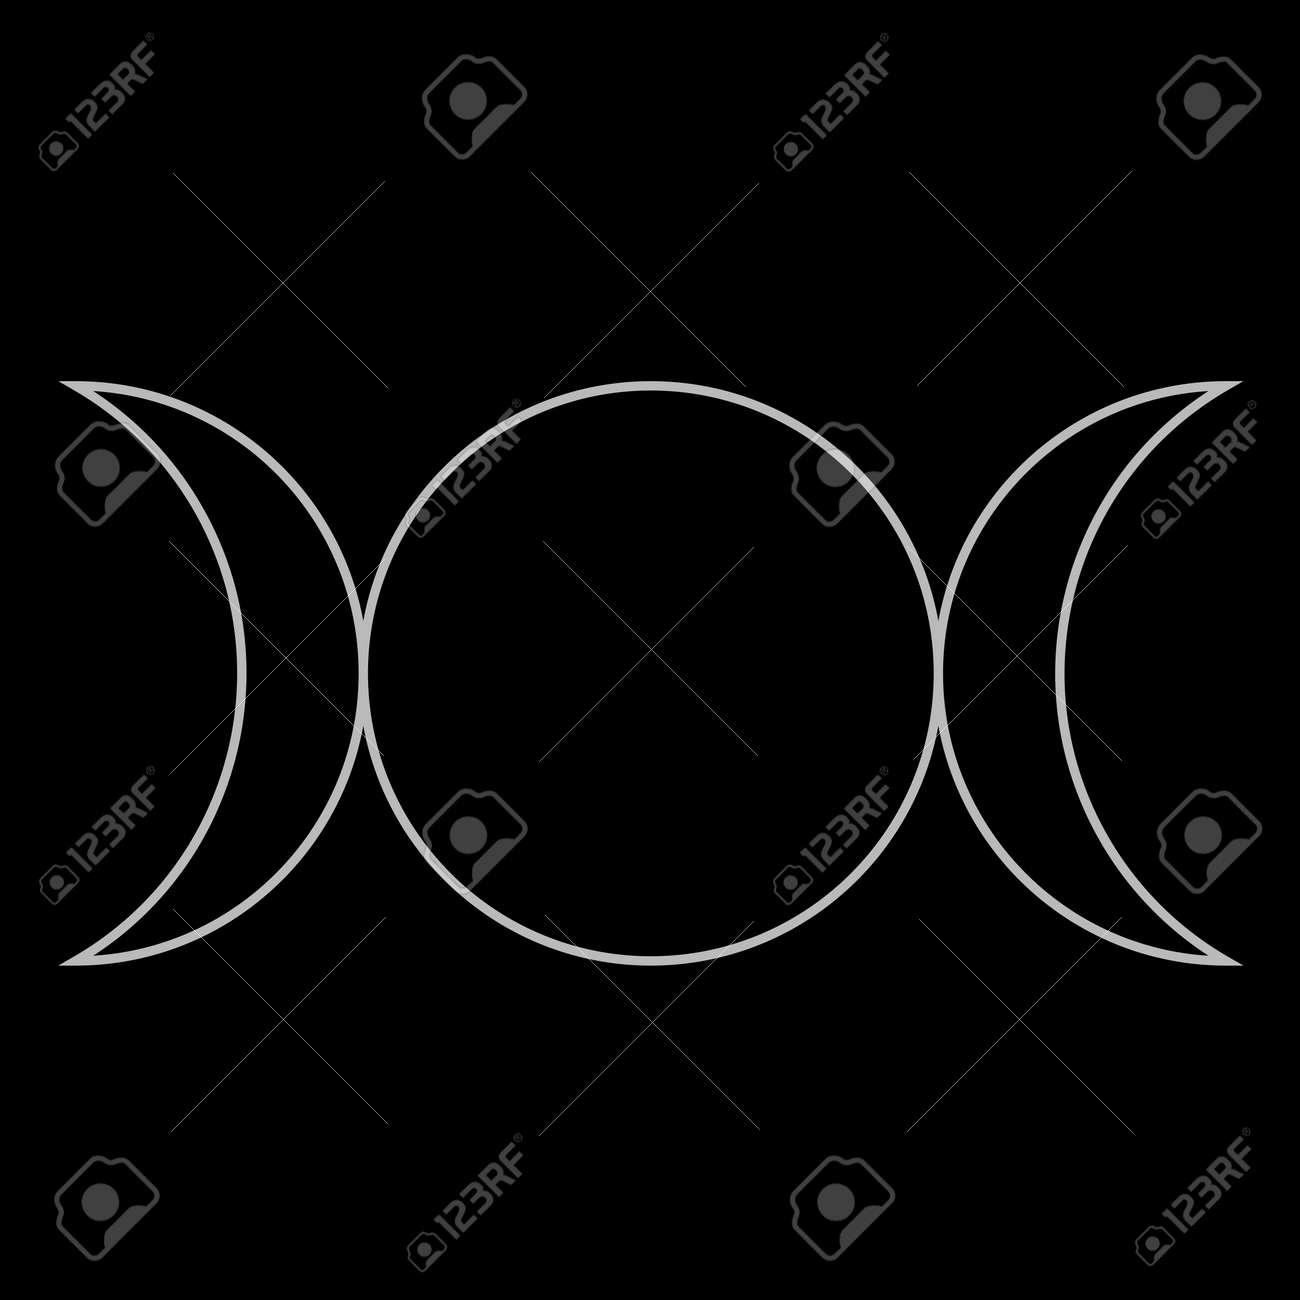 Wiccan symbol triple goddess neopaganism royalty free cliparts wiccan symbol triple goddess neopaganism stock vector 19332154 biocorpaavc Choice Image